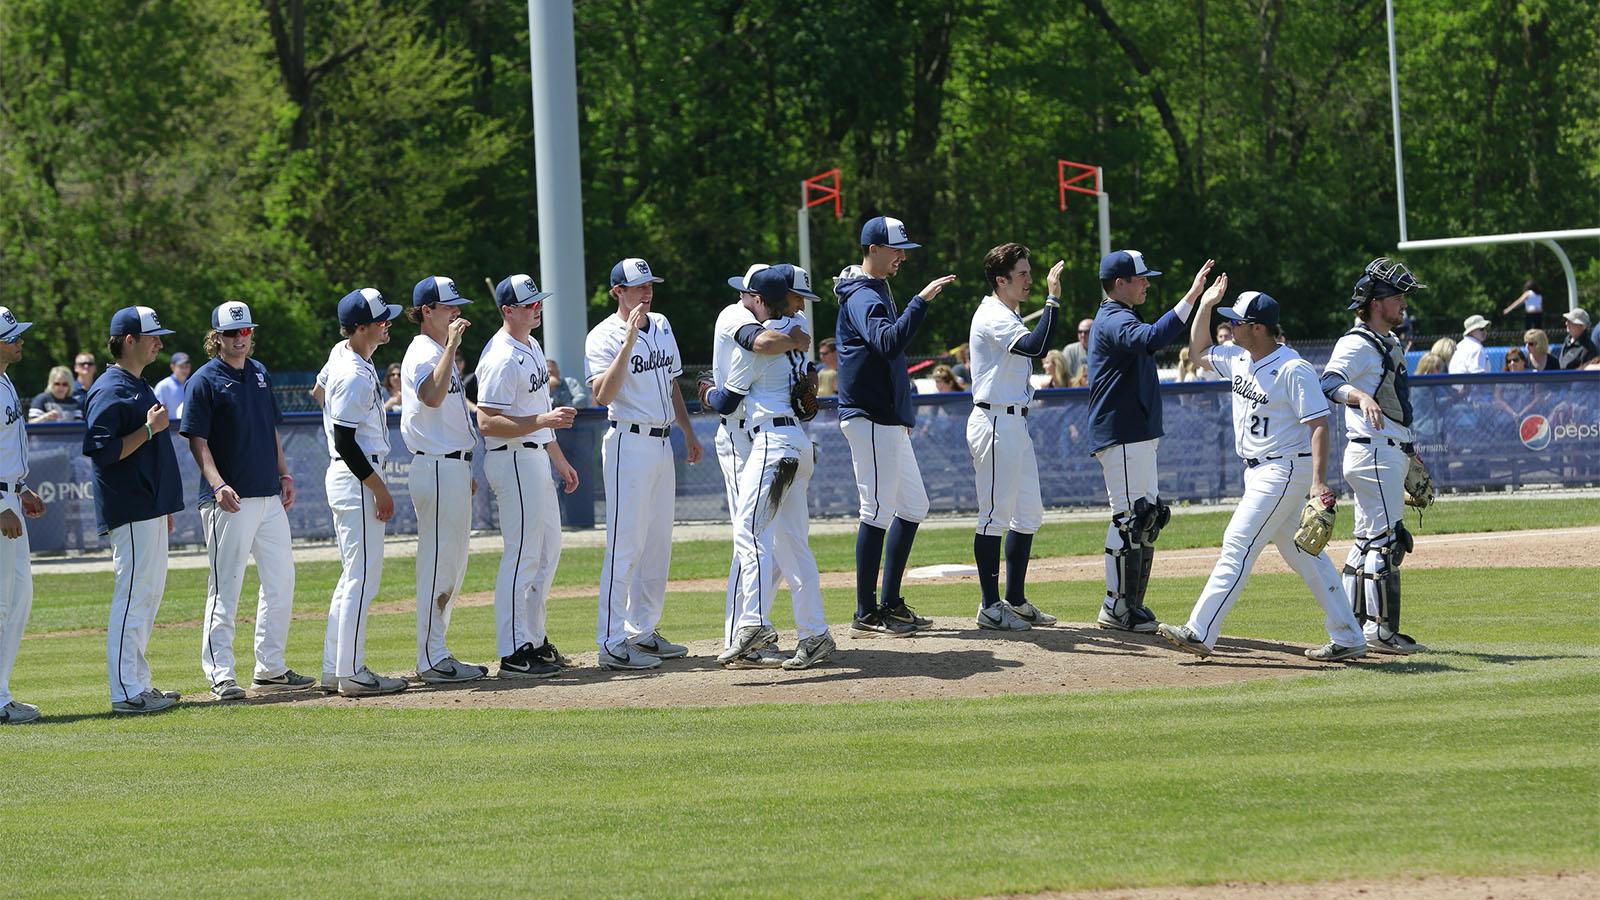 CANCELED - Baseball vs Eastern Illinois